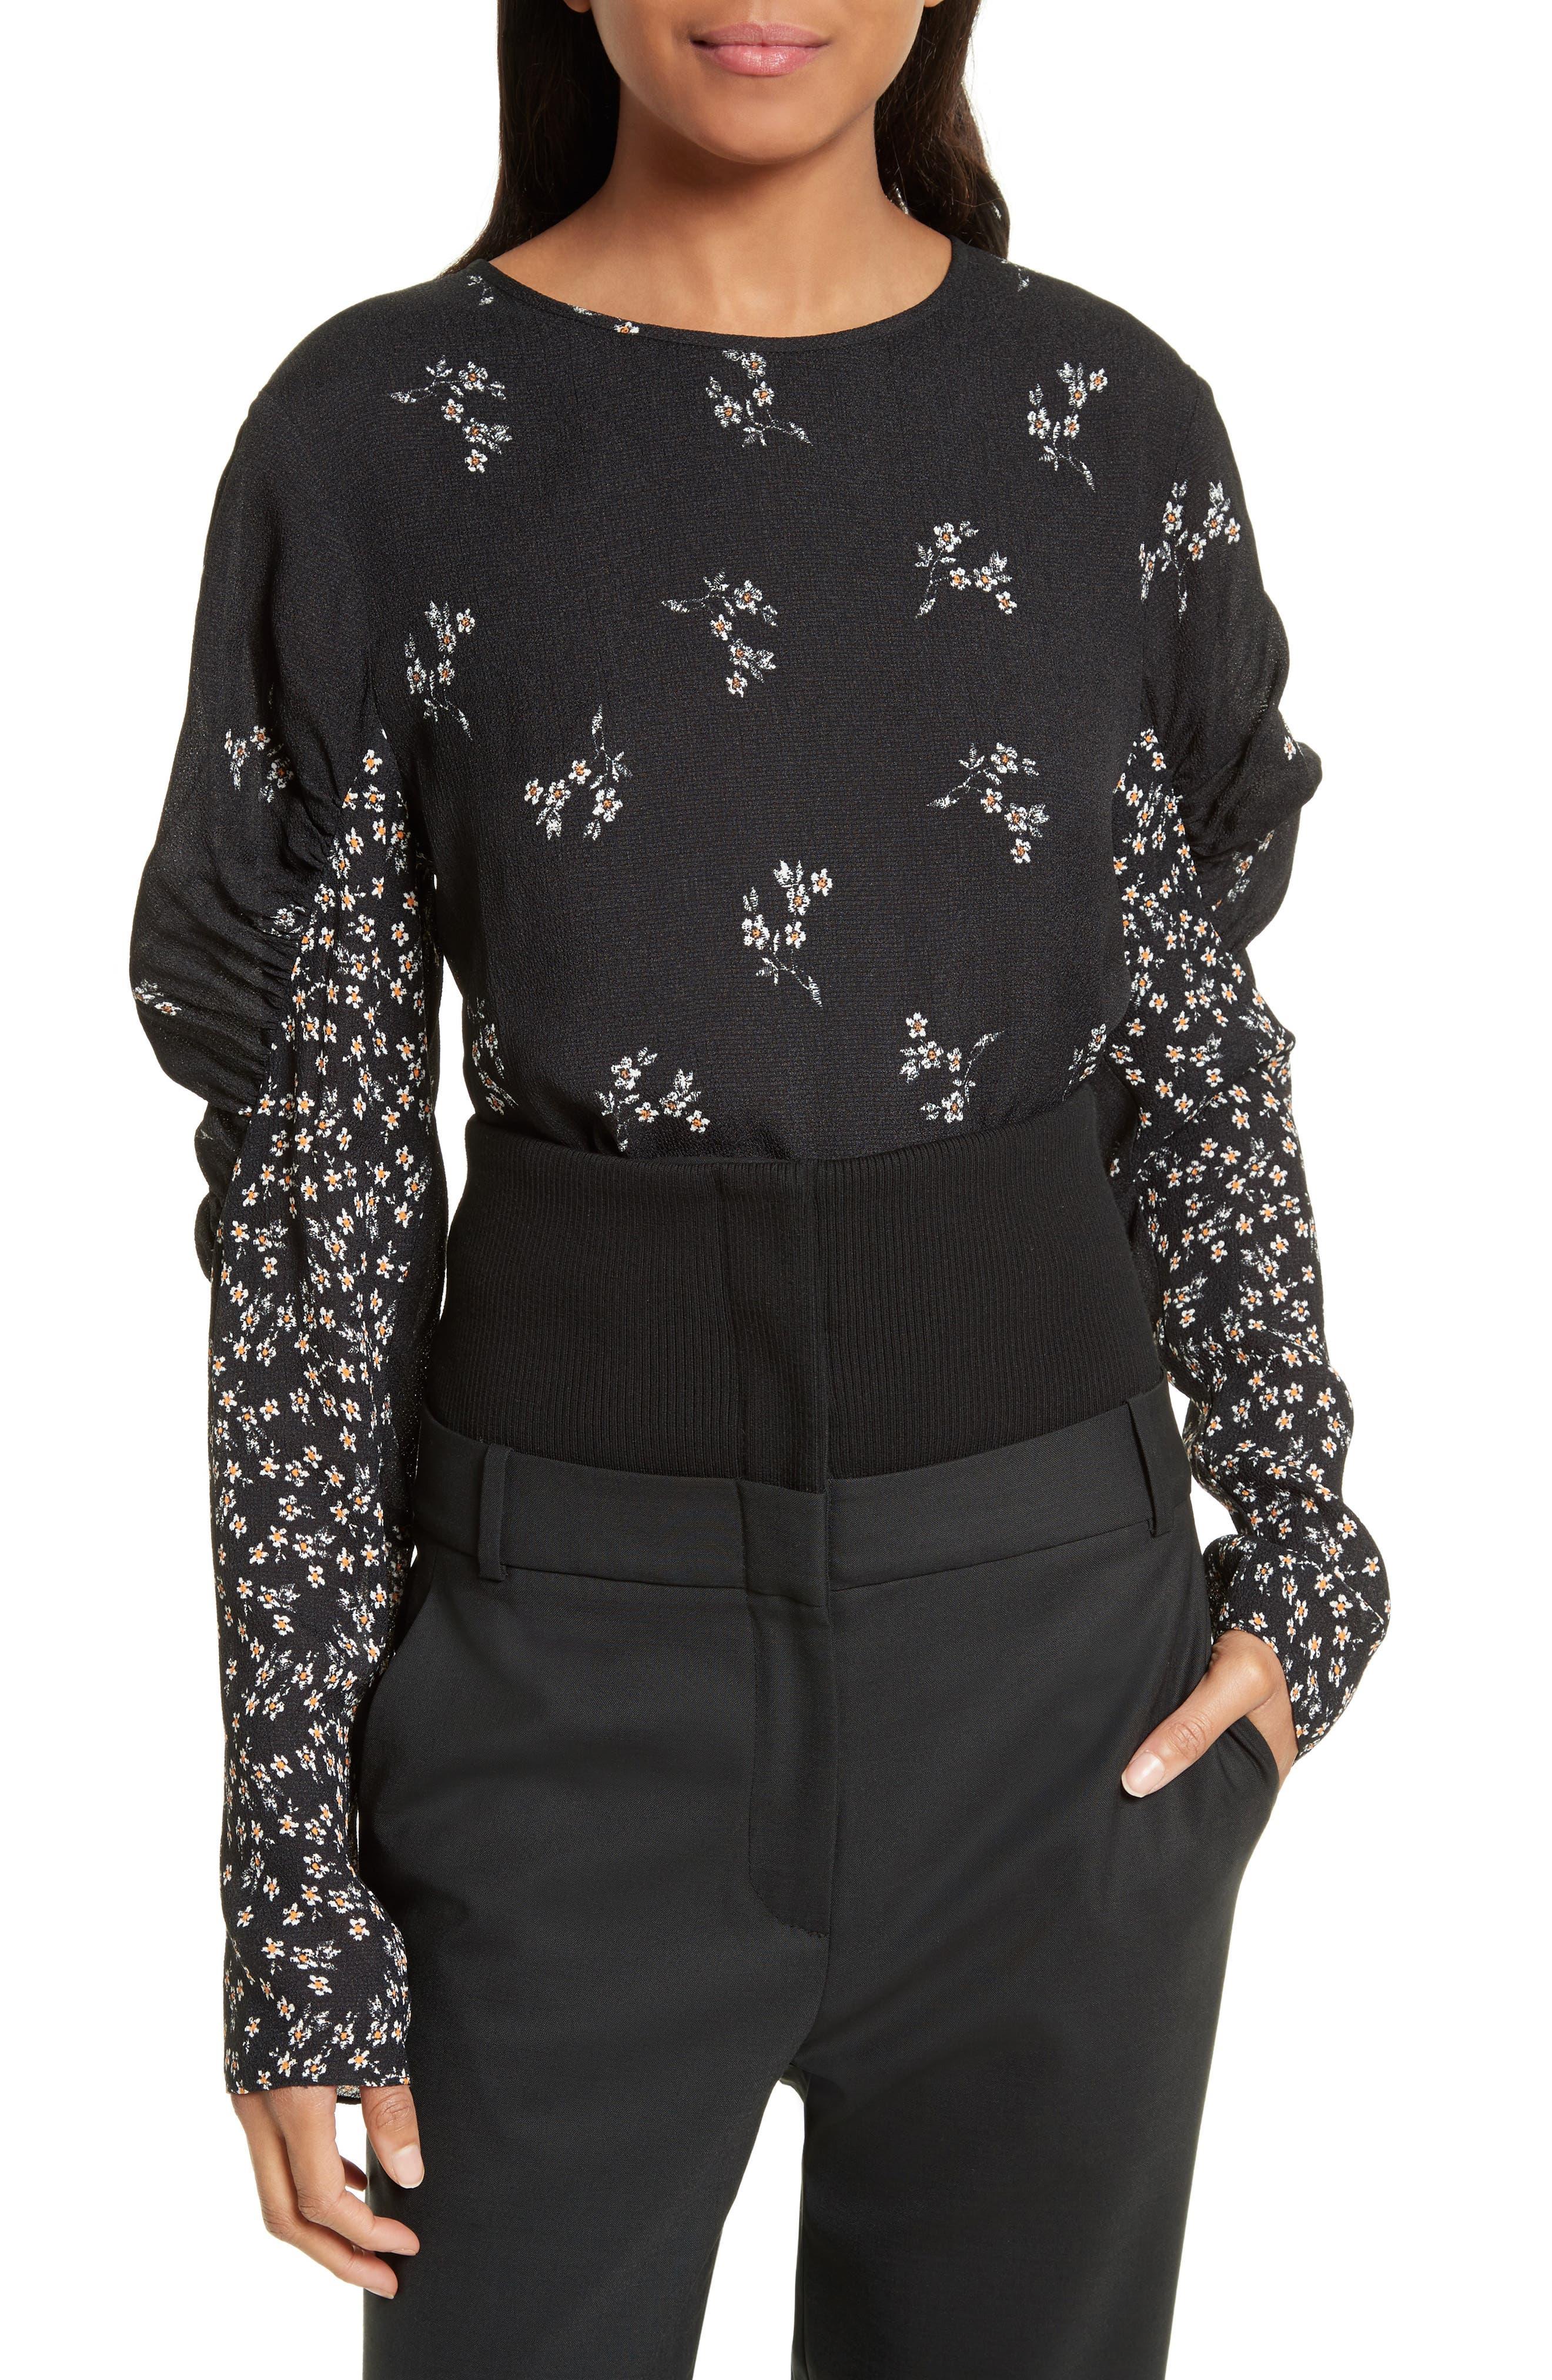 Florence Lili Floral Top,                         Main,                         color, Black Multi